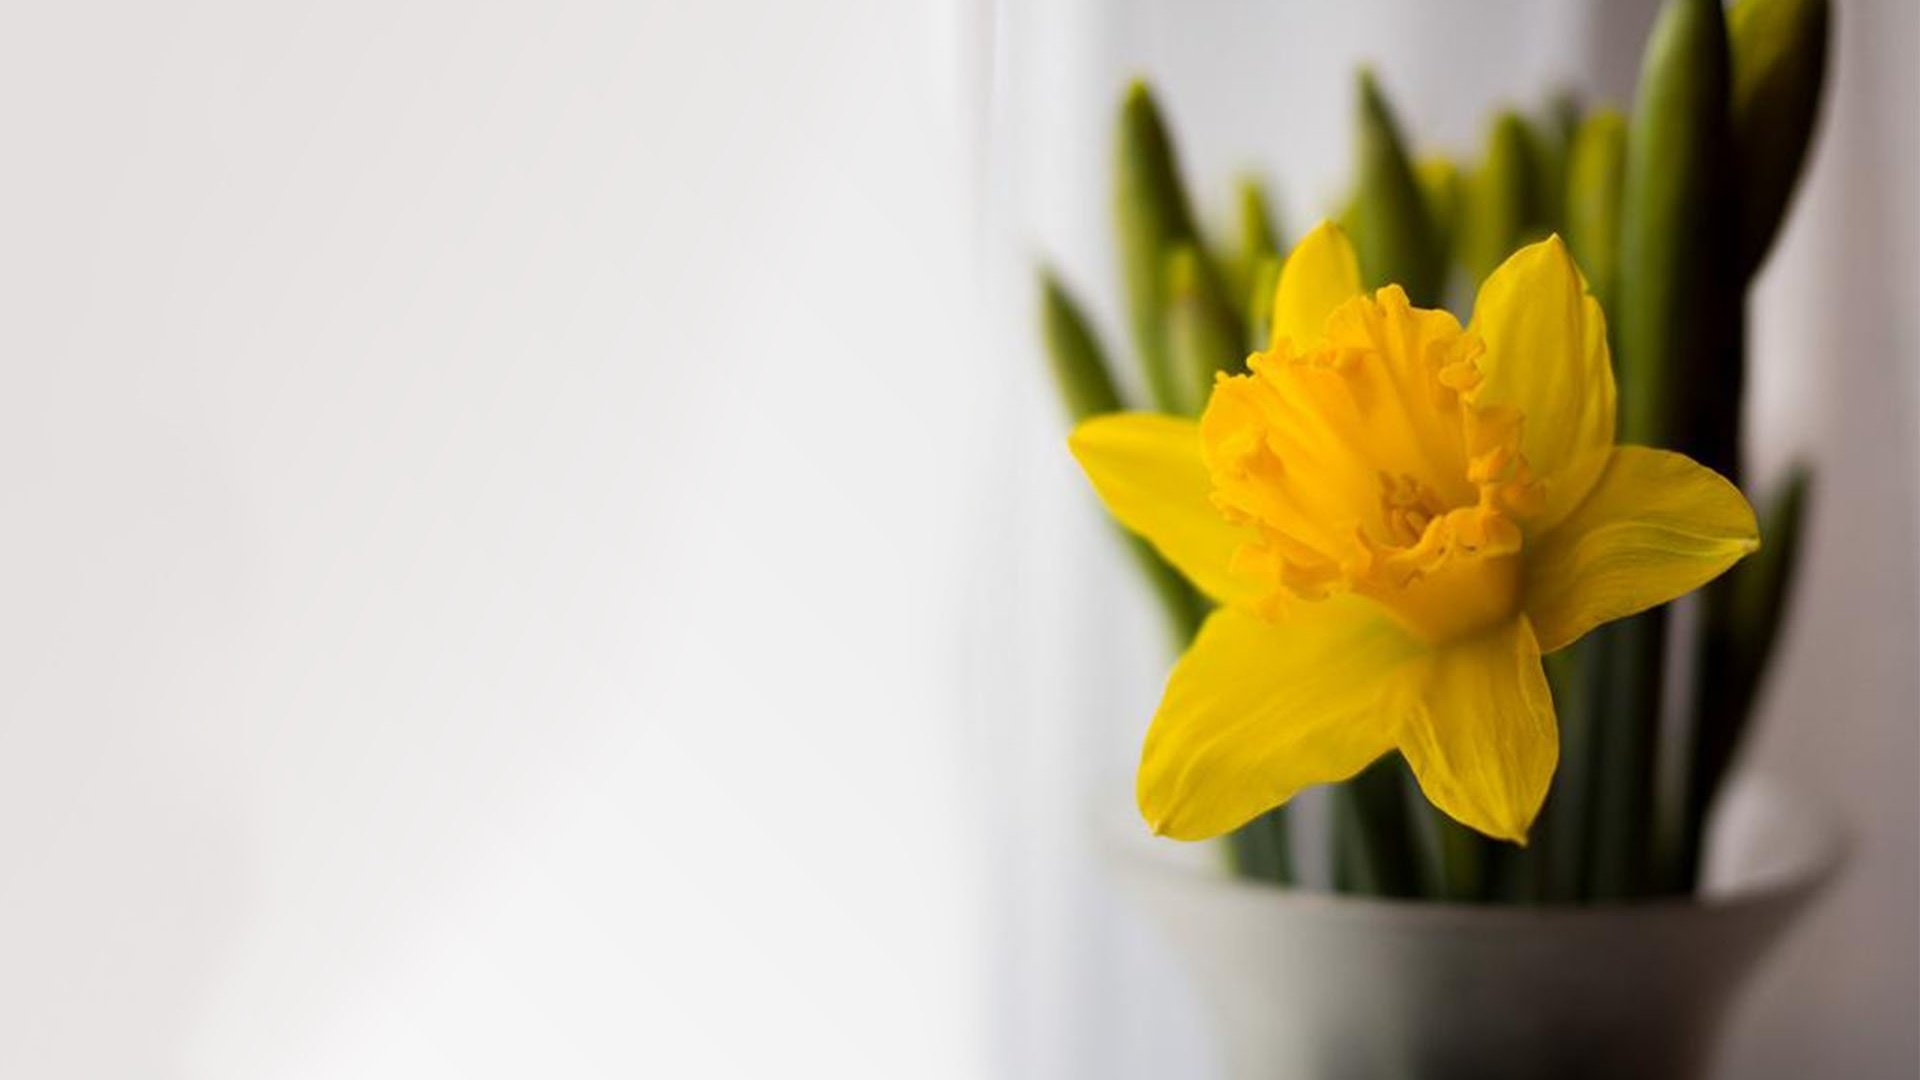 Tulip Minimalist Wallpaper theme